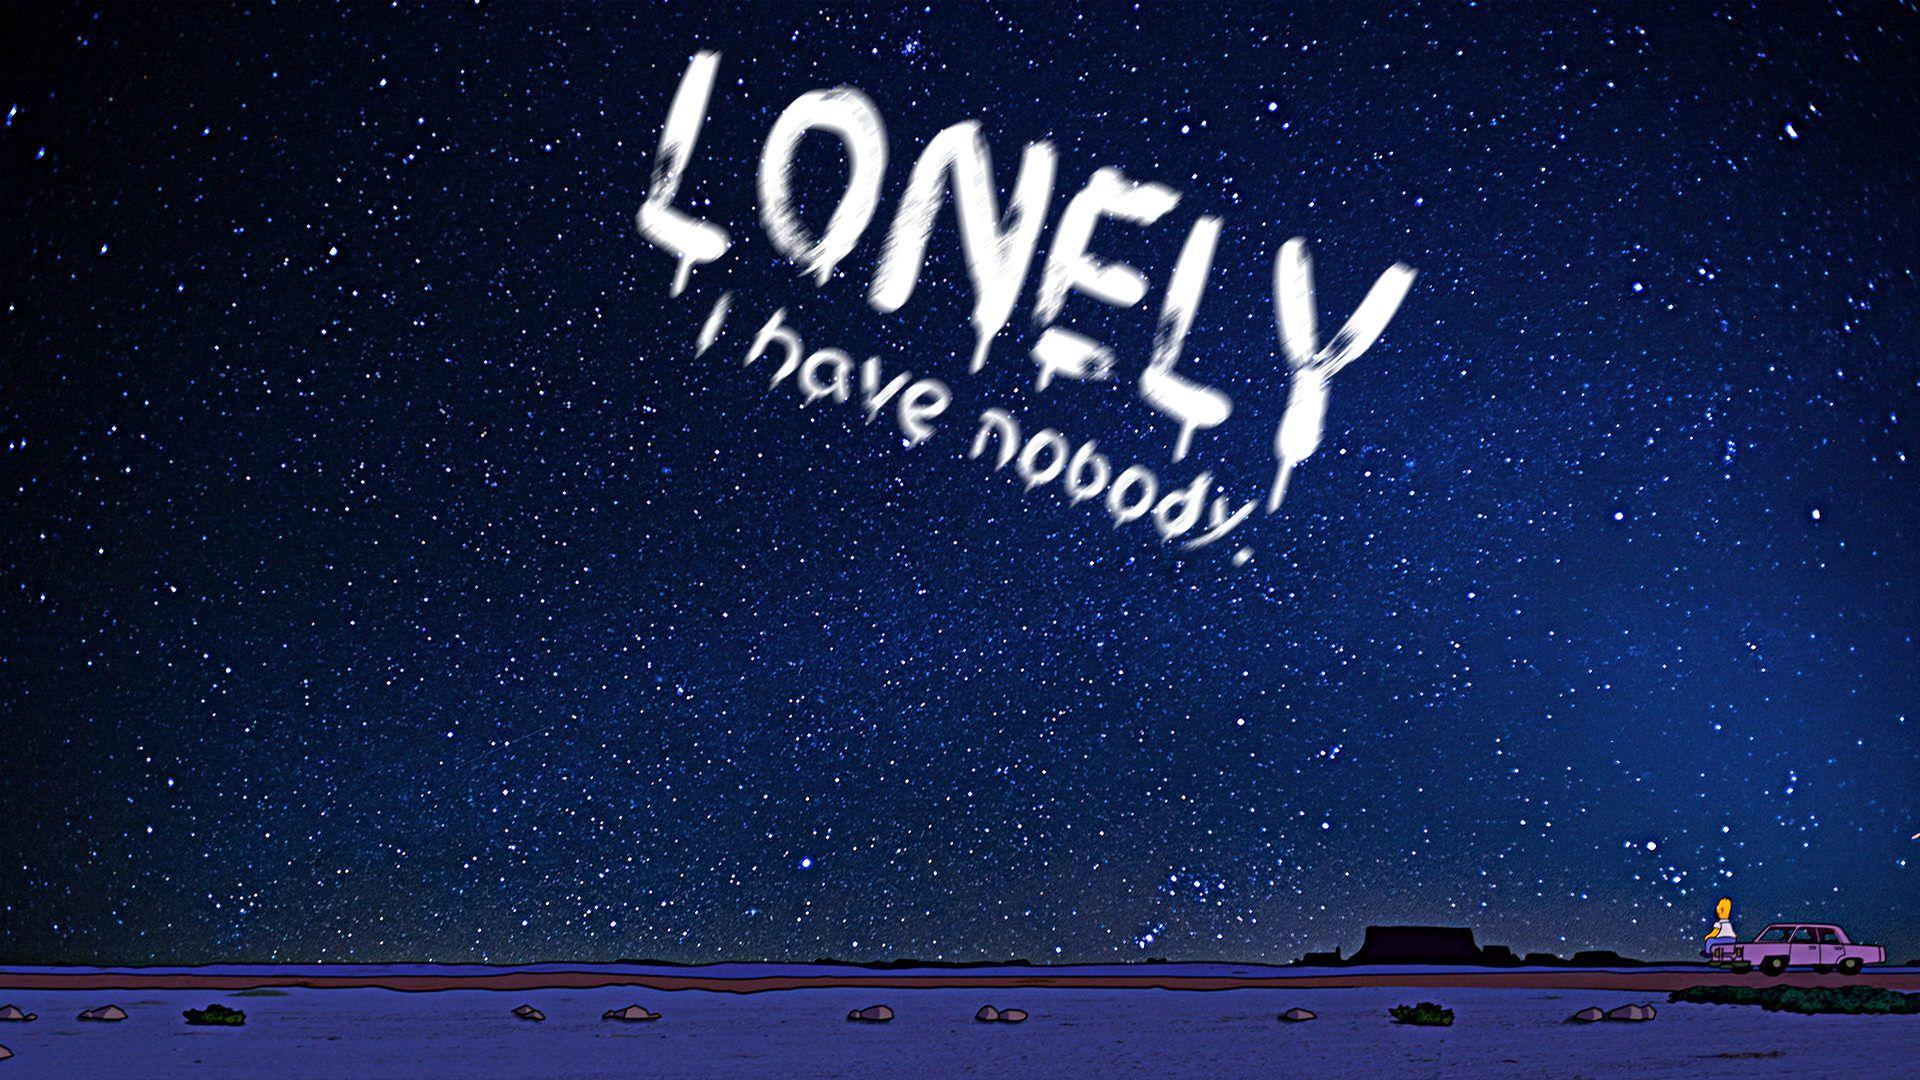 Sad Simpsons Wallpapers Top Free Sad Simpsons Backgrounds Wallpaperaccess